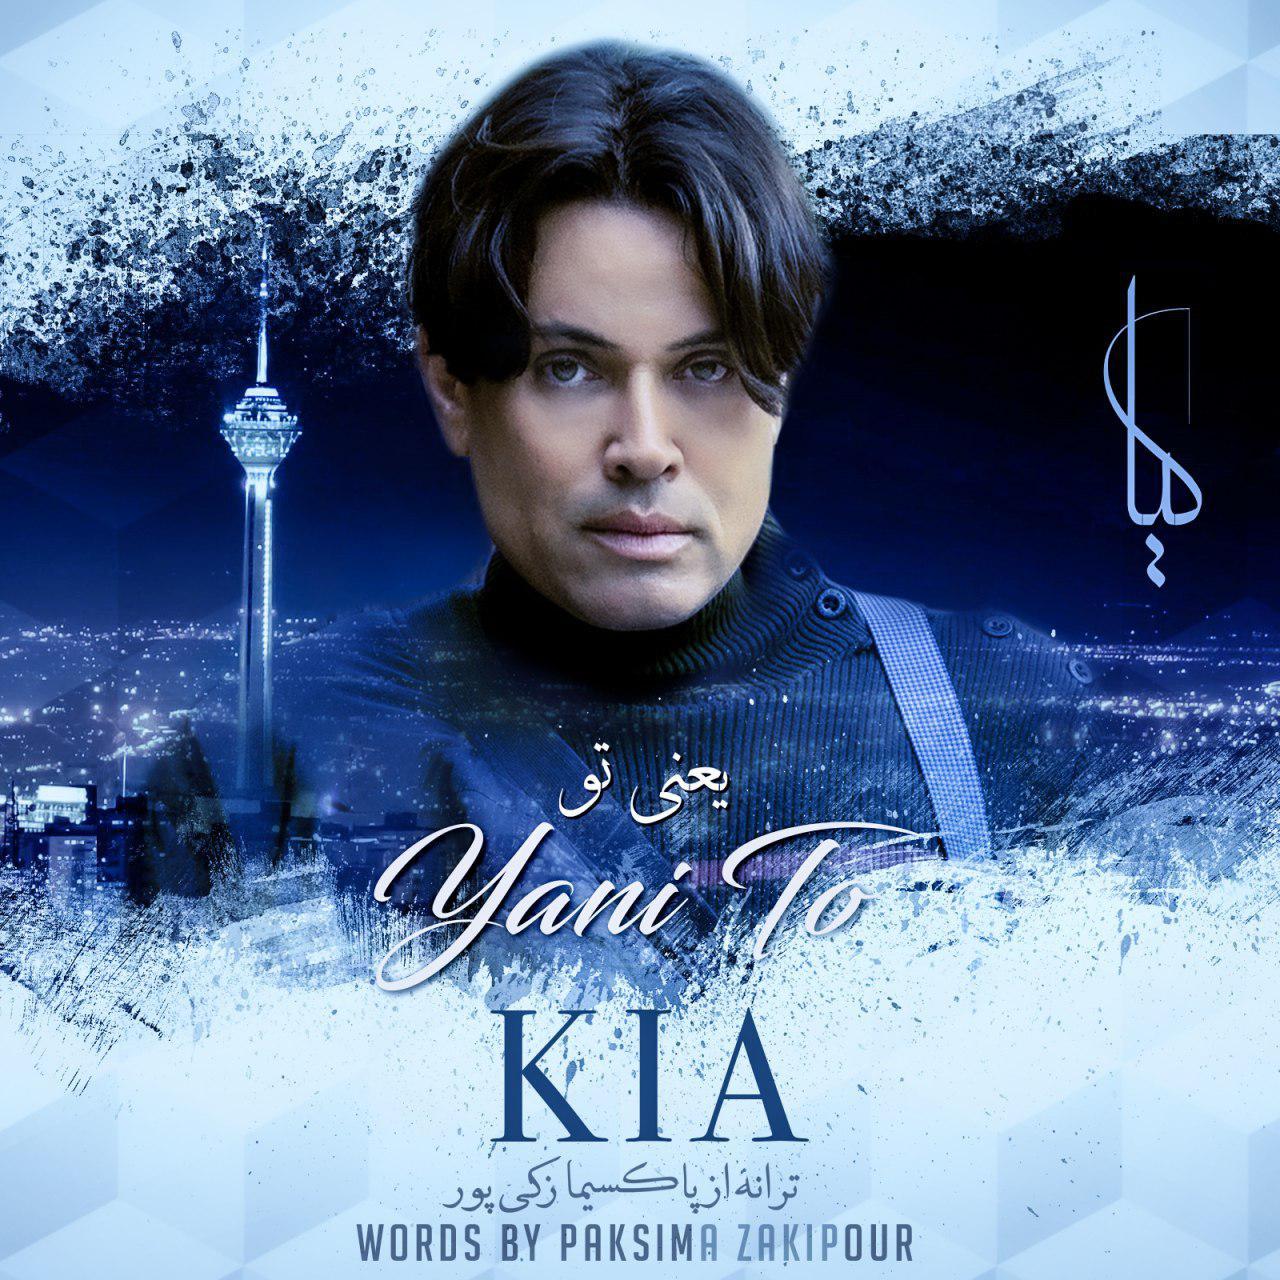 Kia - Yani To - دانلود آهنگ کیا به نام یعنی تو